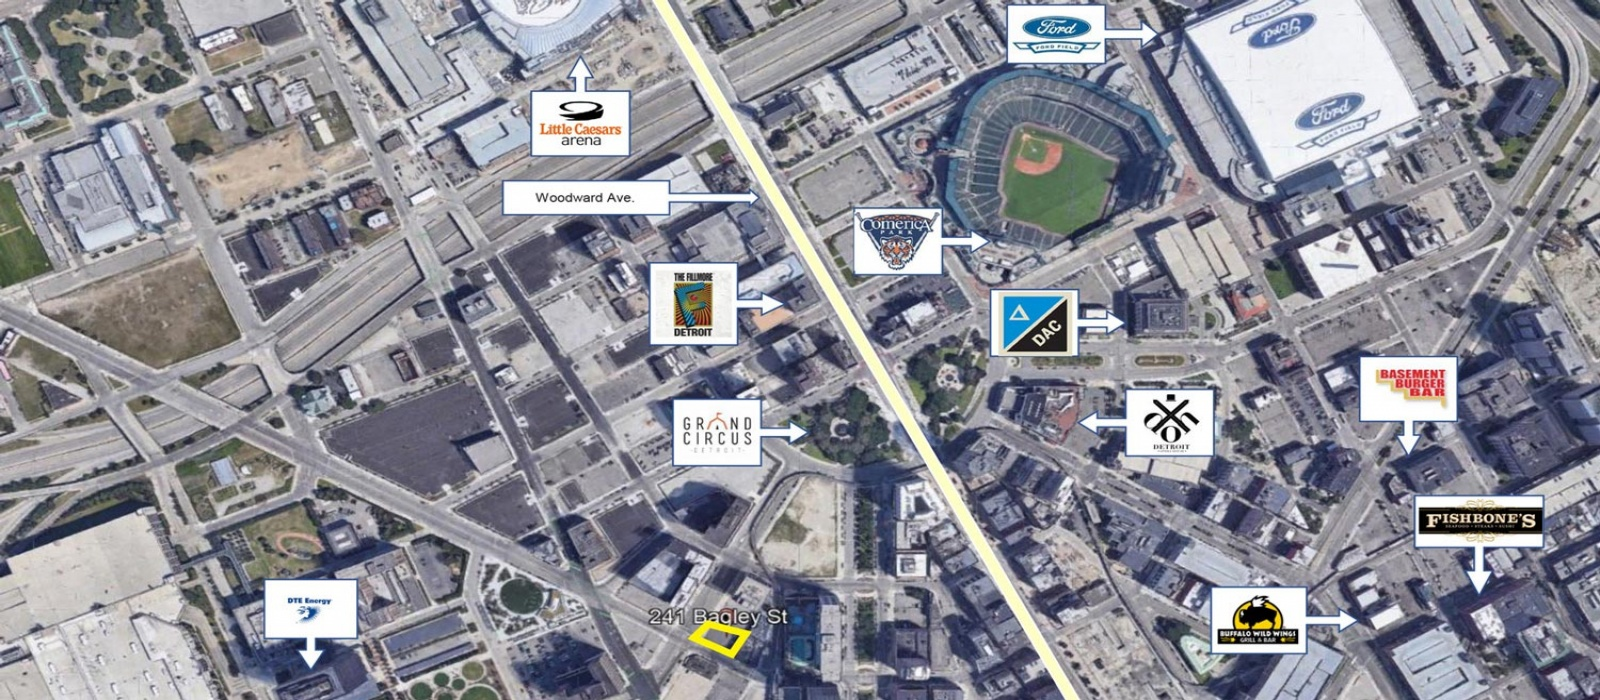 241 Bagley St, Detroit, Michigan 48226, ,Office,For Sale,241 Bagley St,1010